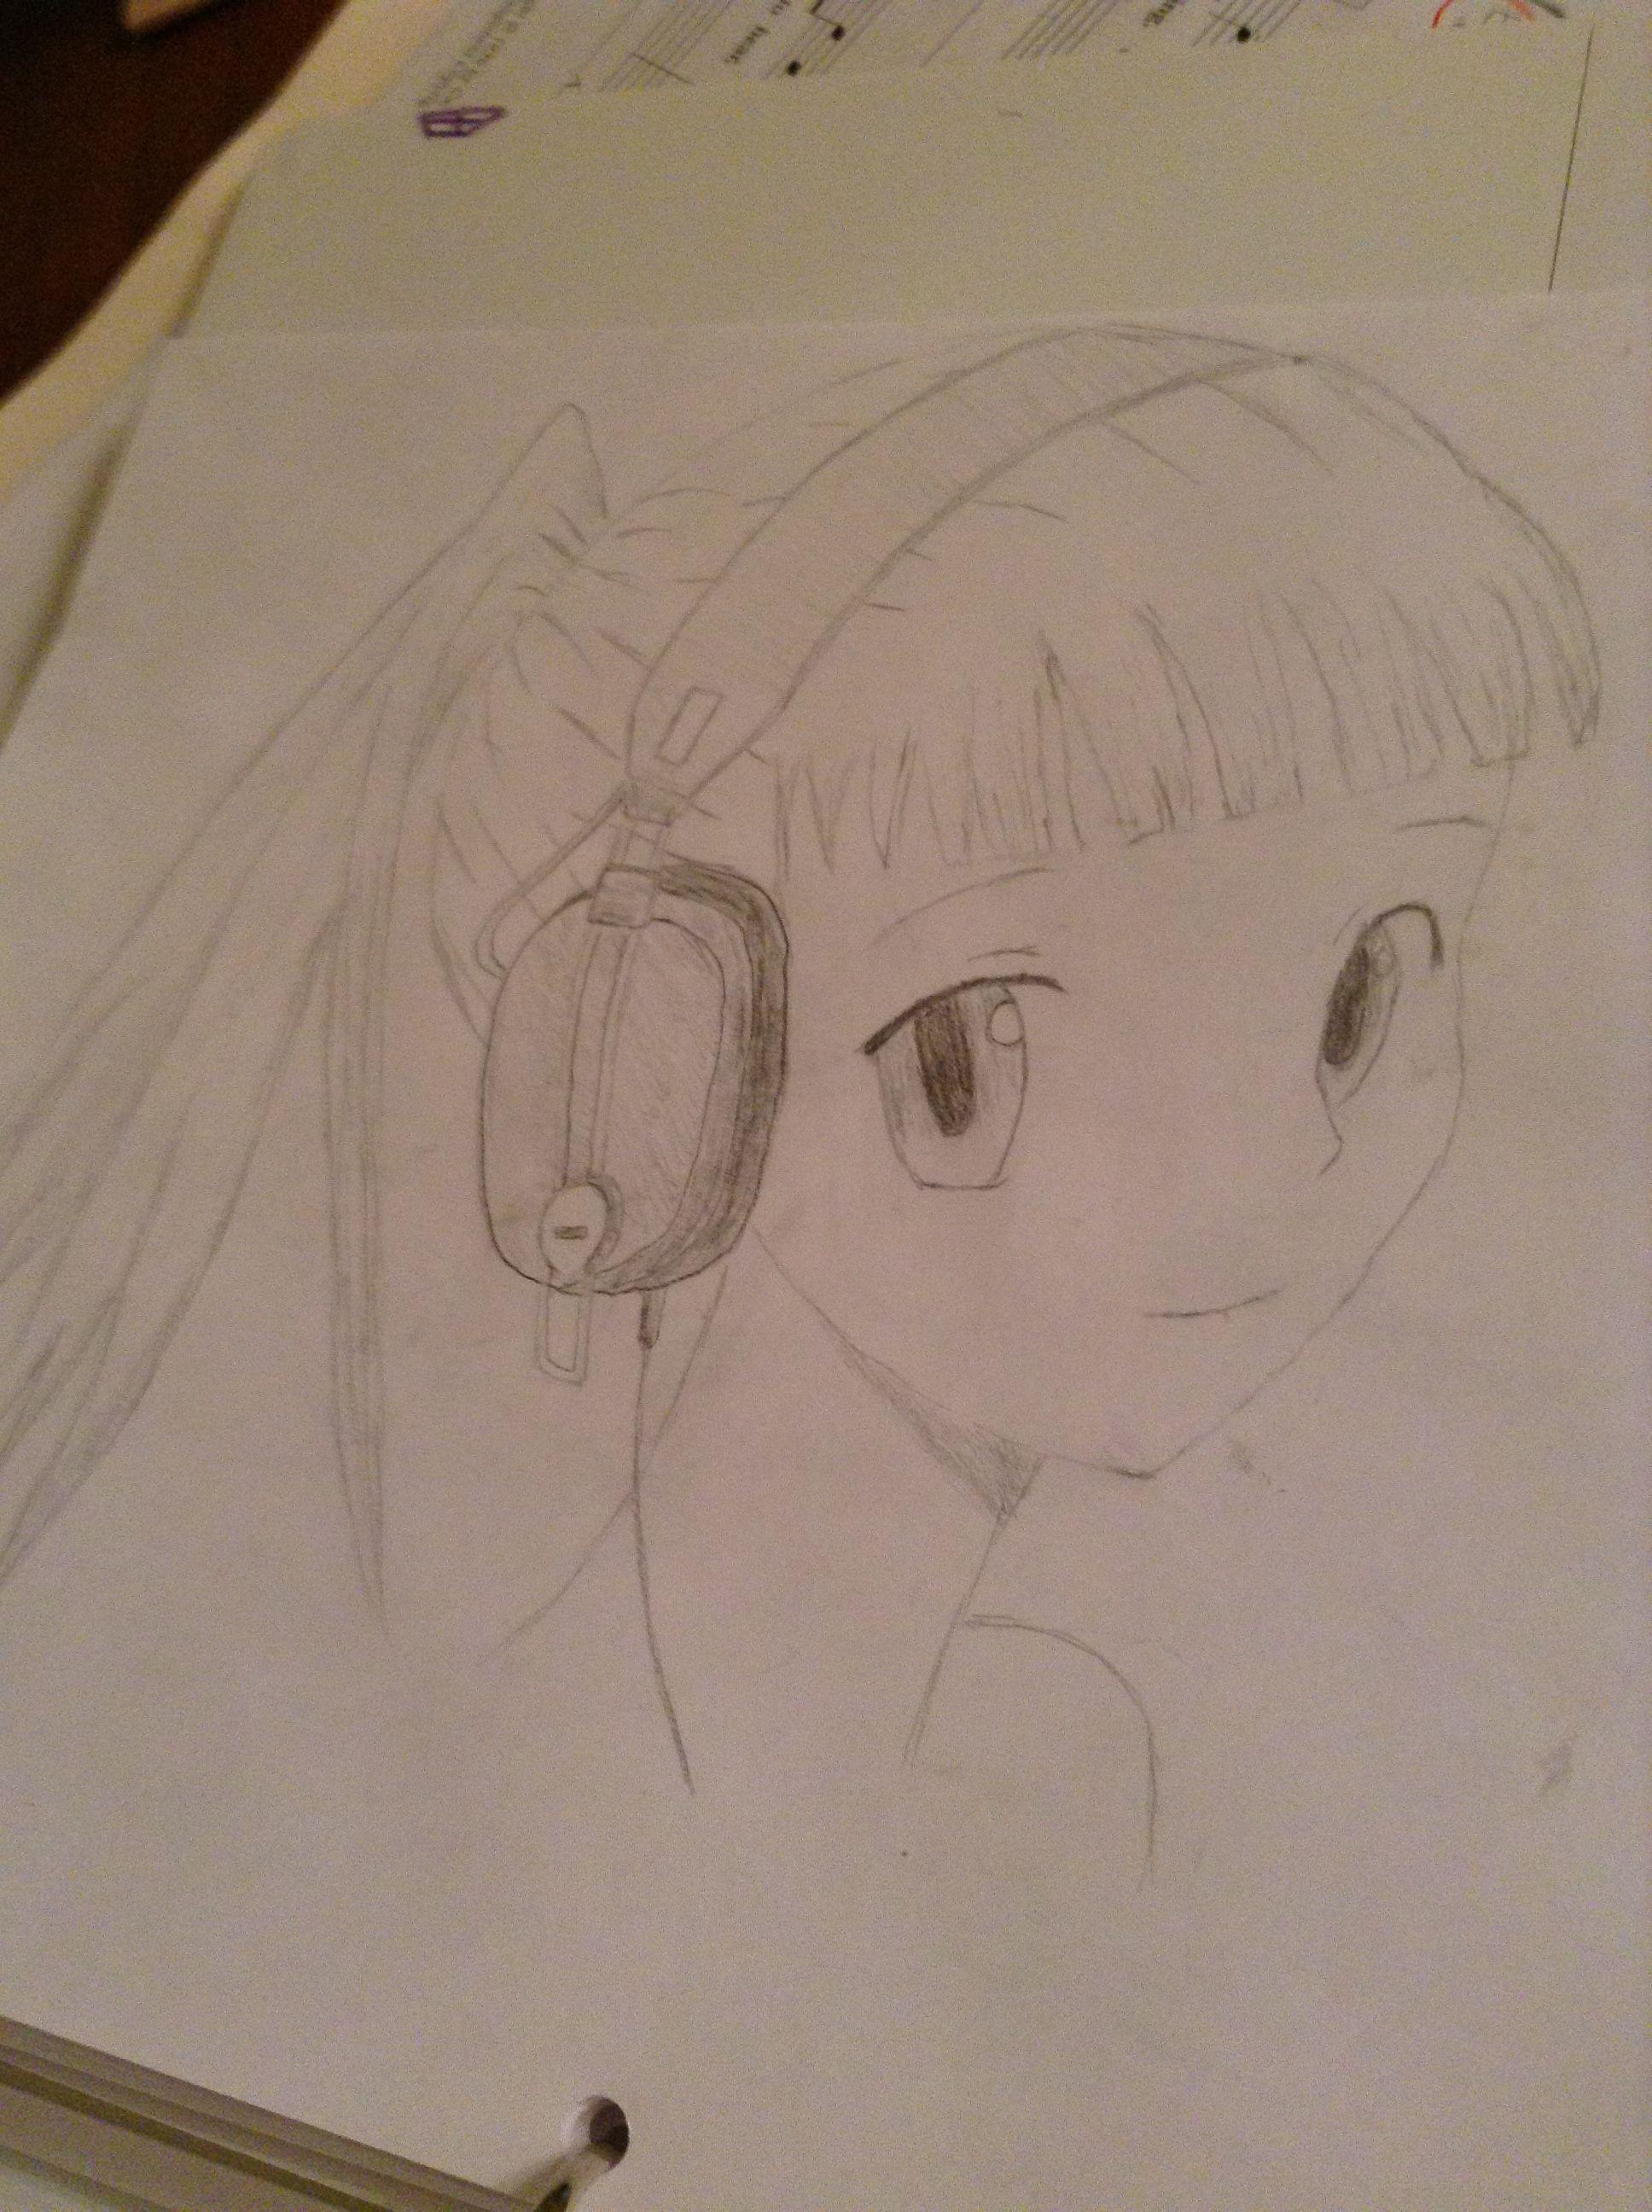 Cute anime girl with headphones